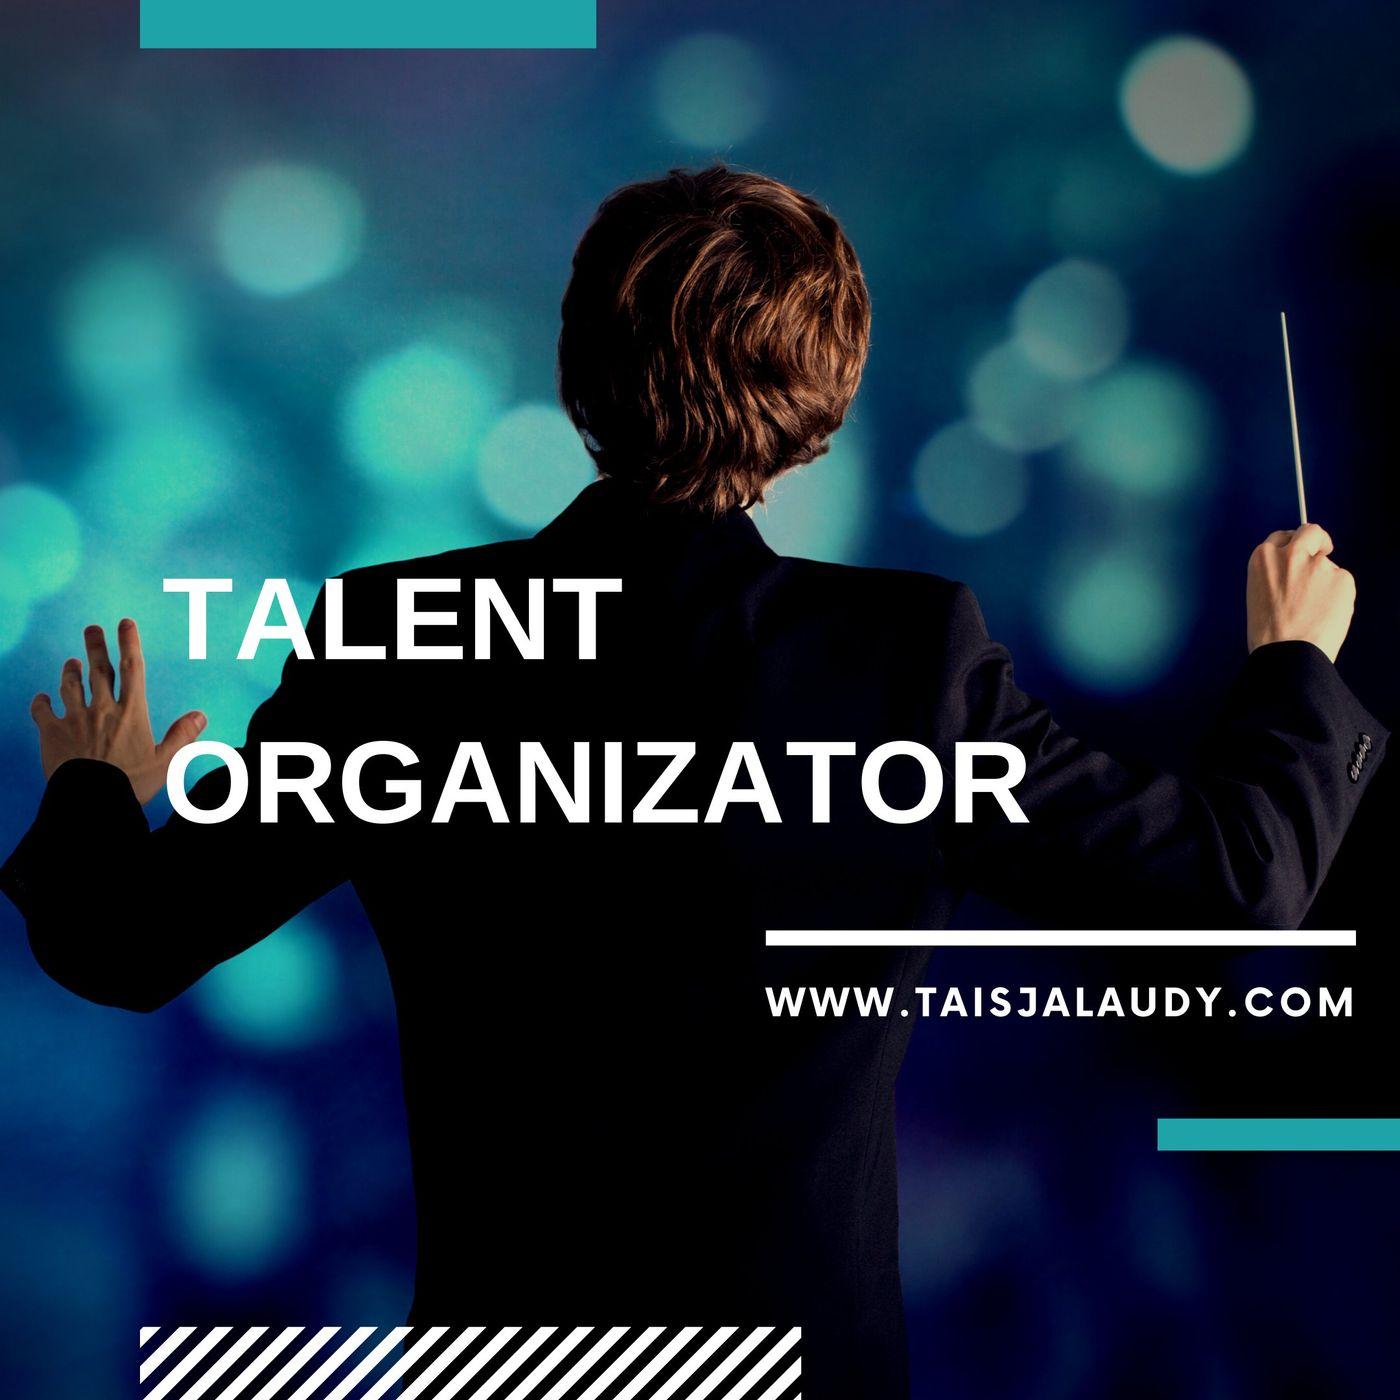 Talent Organizator (Arranger) - Test GALLUPa, Clifton StrengthsFinder 2.0